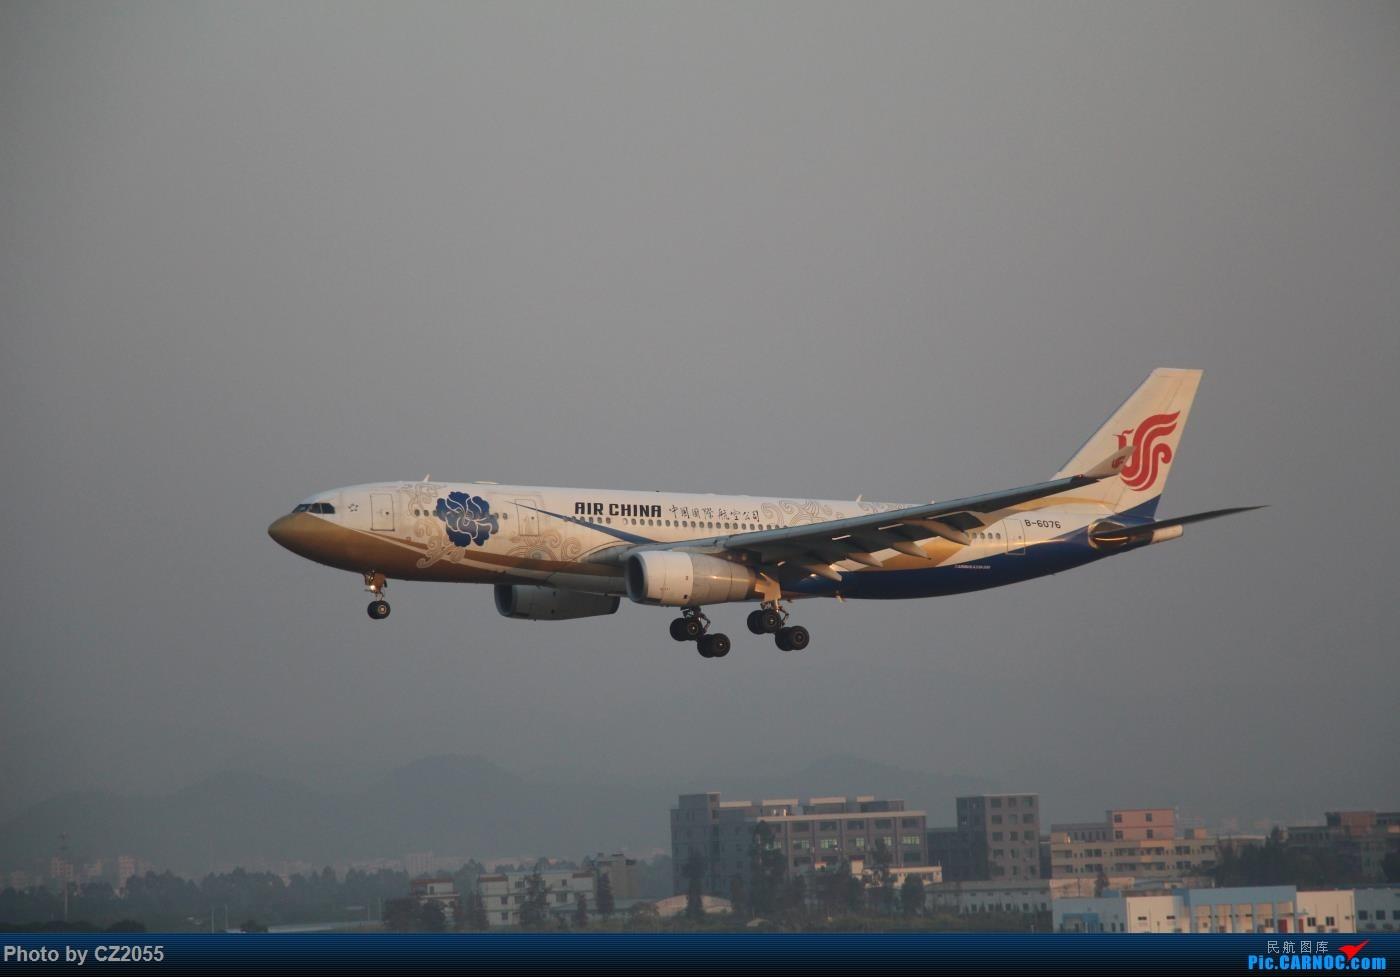 Re:[原创]【广东青少年拍机小队】【C-Z-2055】2015即将结束,来做个总结。 AIRBUS A330-200 B-6076 中国广州白云国际机场